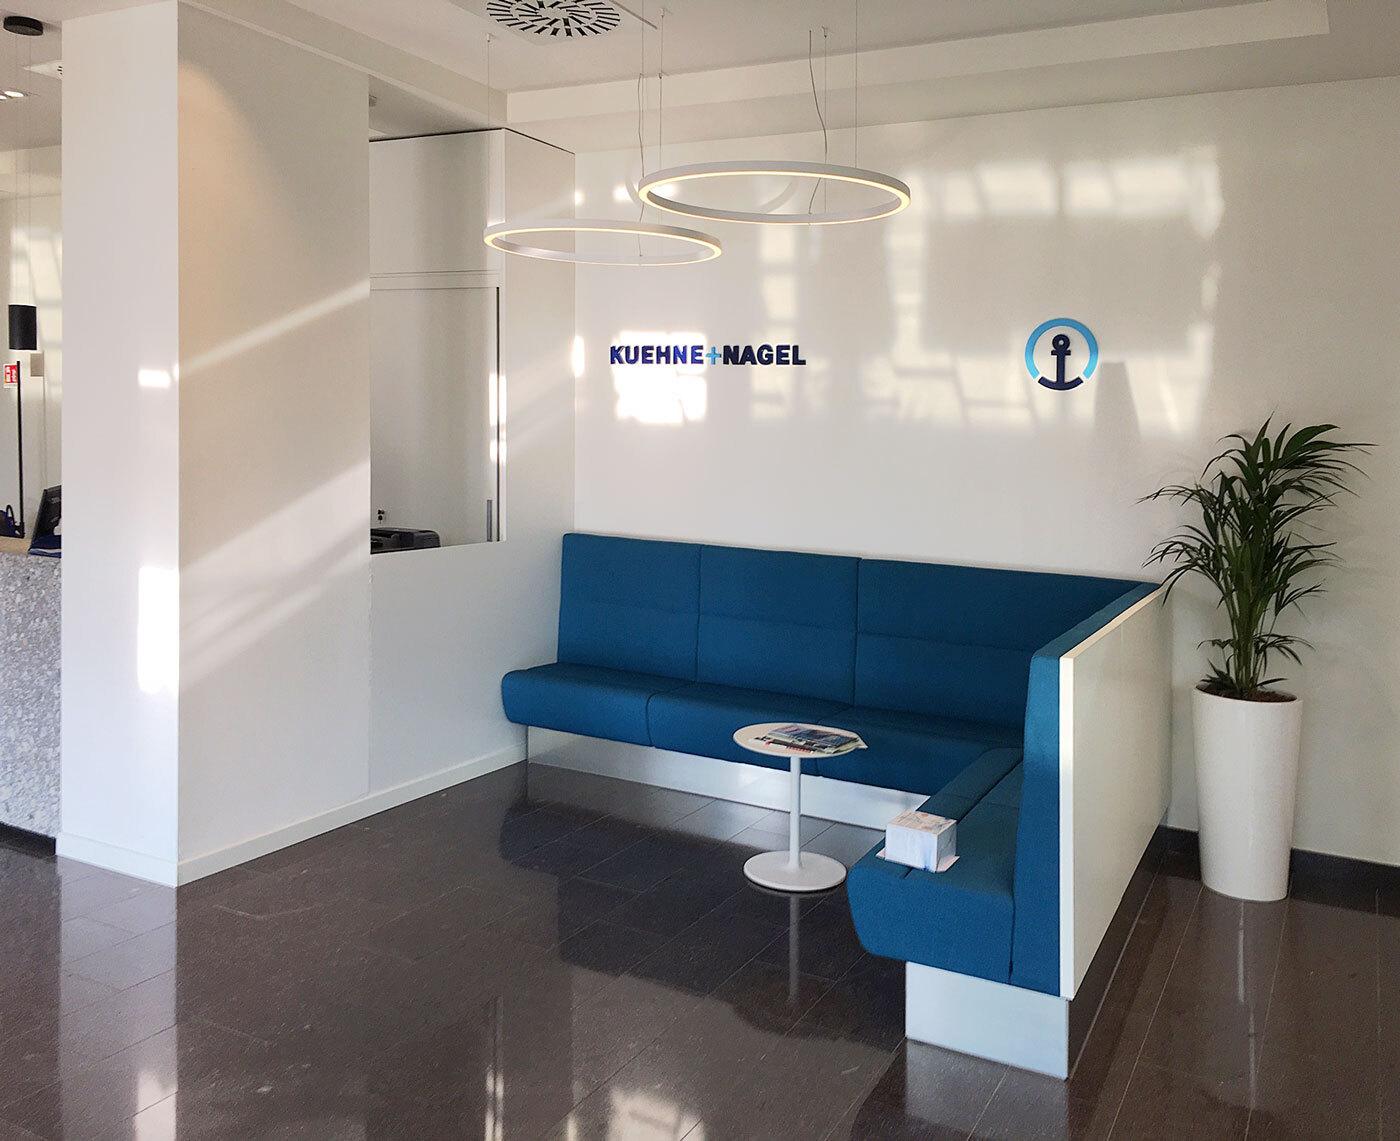 kuehnenagel-logistic-office-furniture-02.JPG